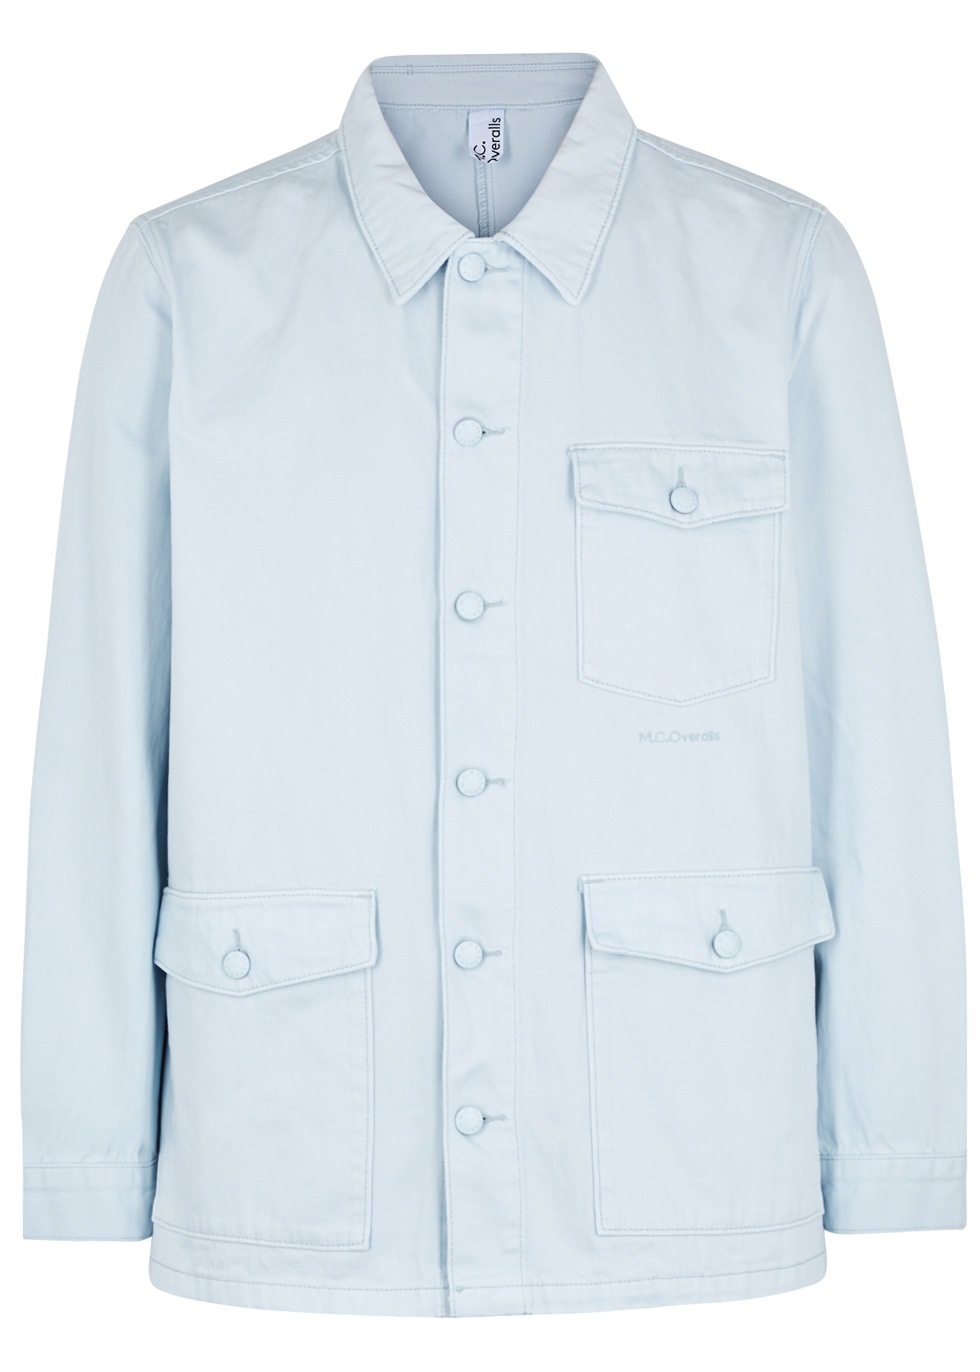 M.C. OVERALLS Light Blue Denim Jacket